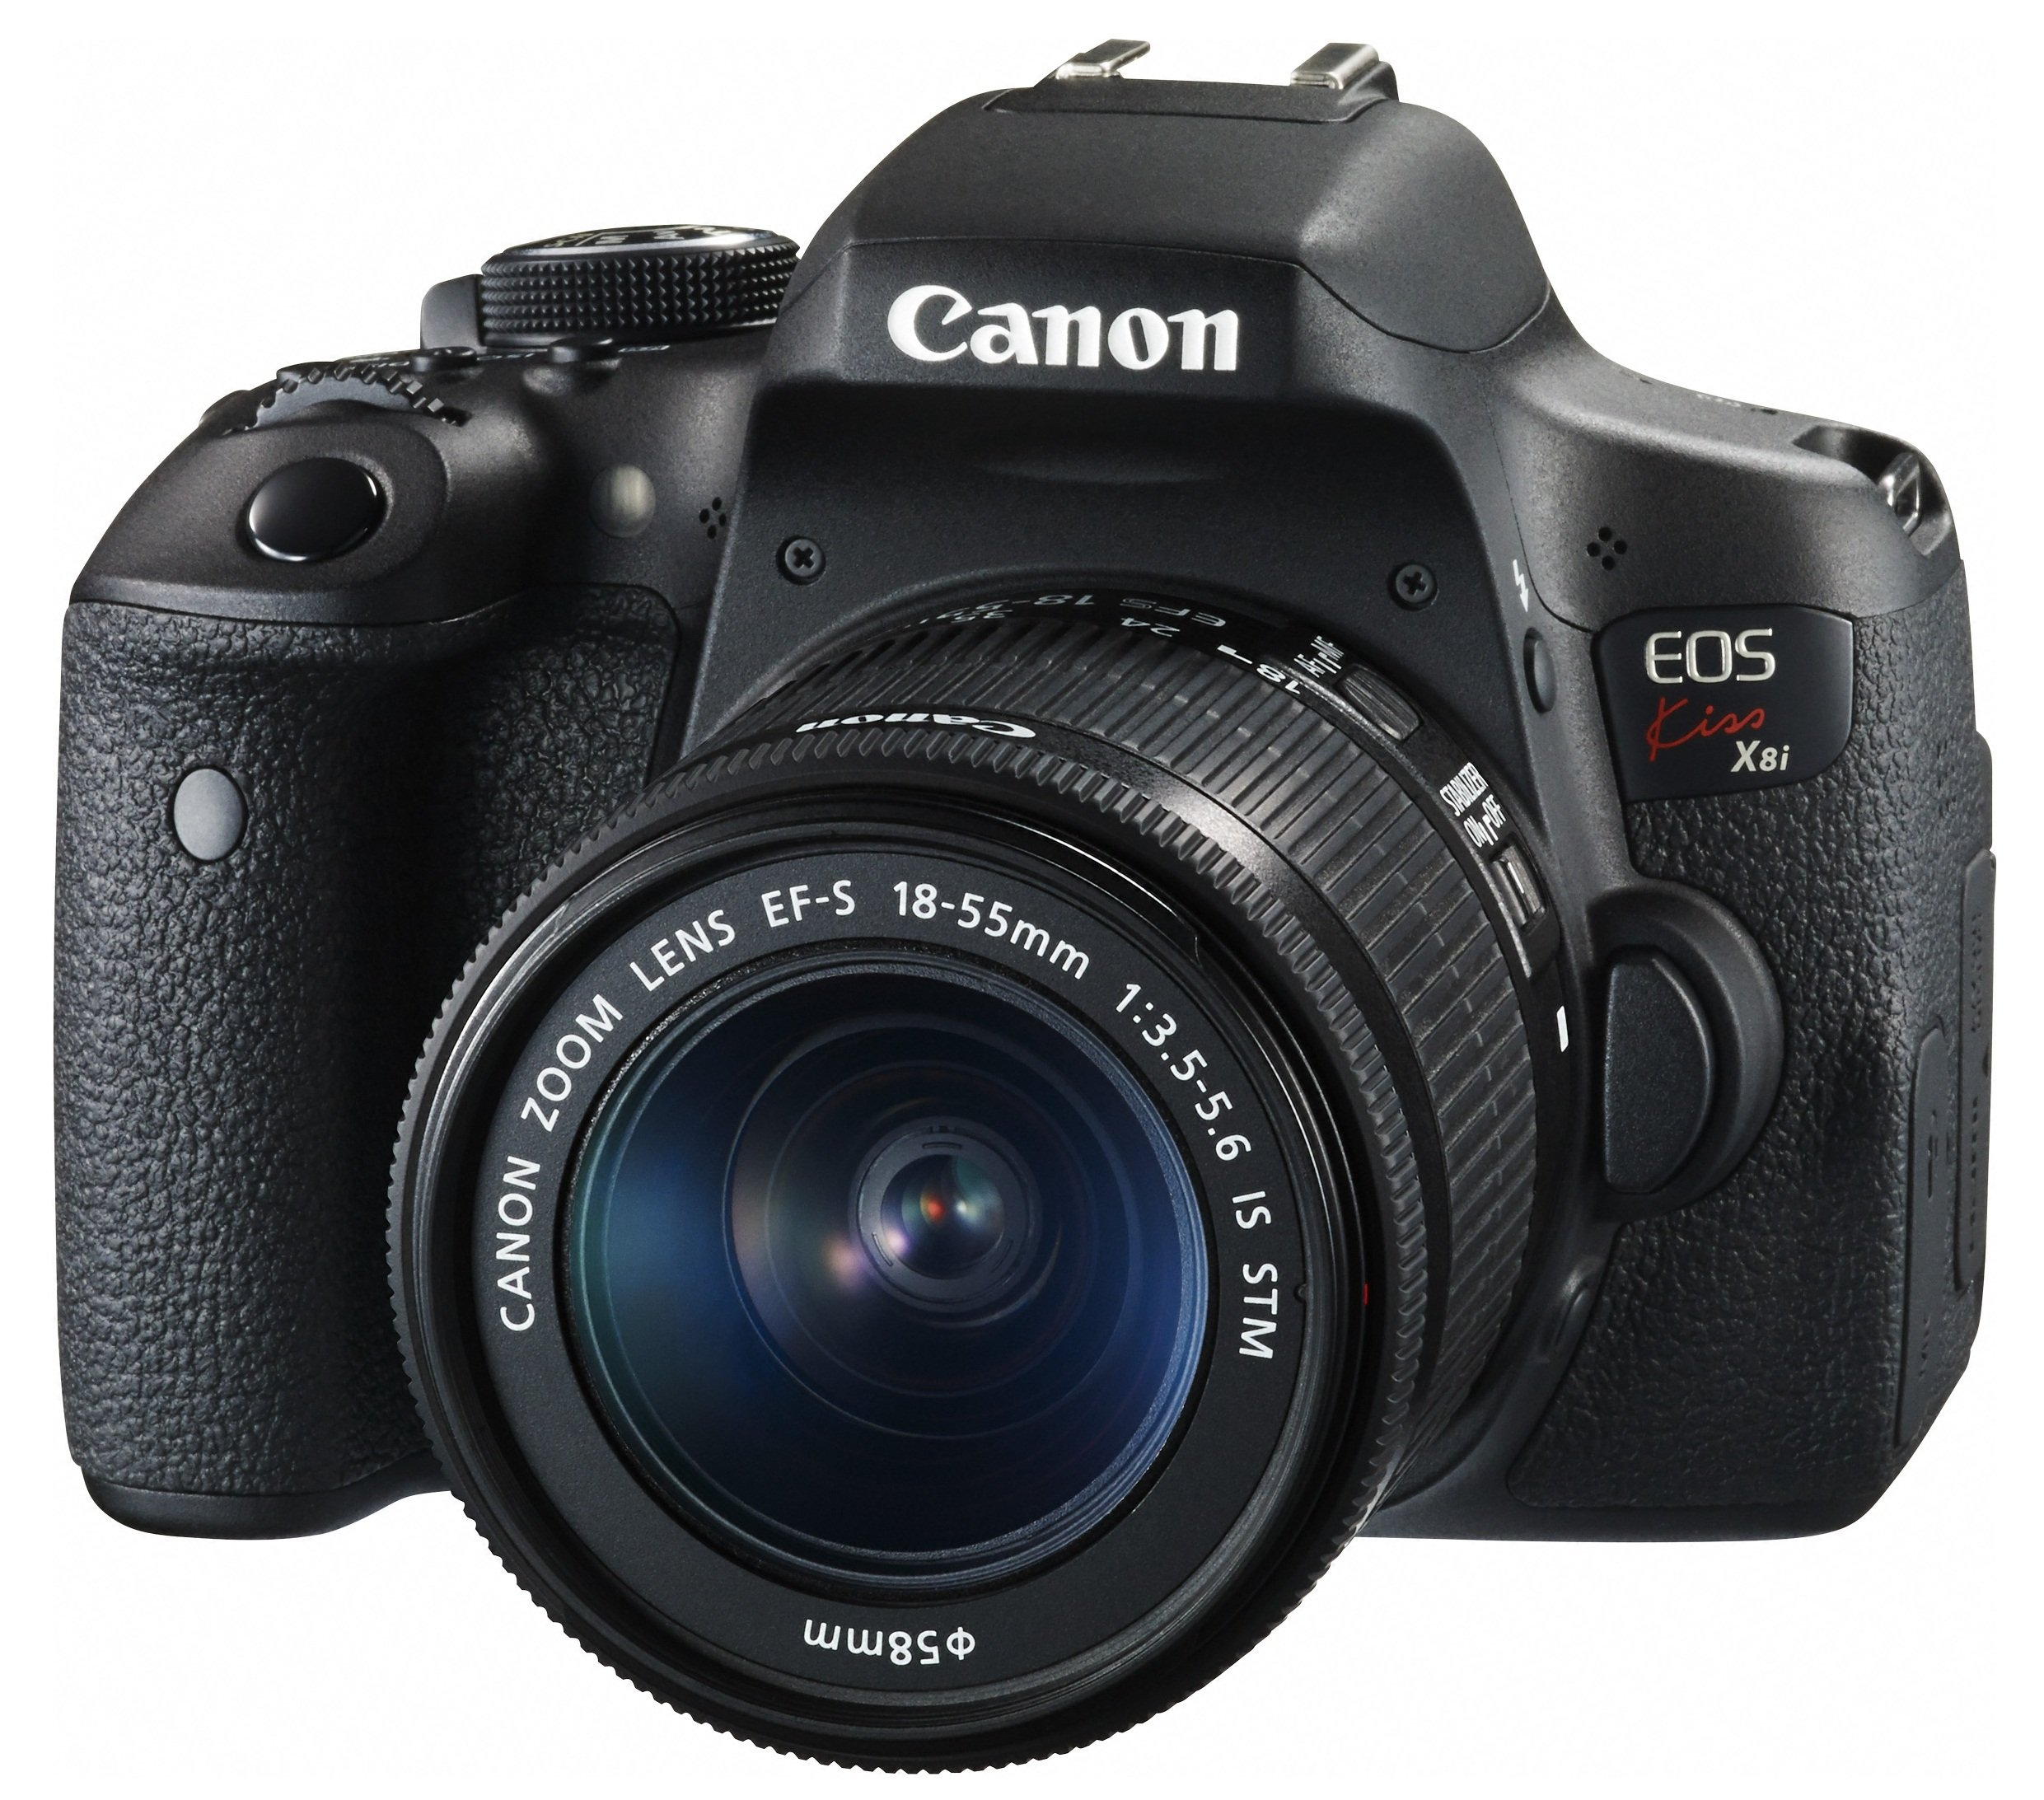 Canon デジタル一眼レフカメラ EOS Kiss X8i レンズキット EF-S18-55mm F3.5-5.6 IS STM 付属 KISSX8I-1855ISSTMLK product image